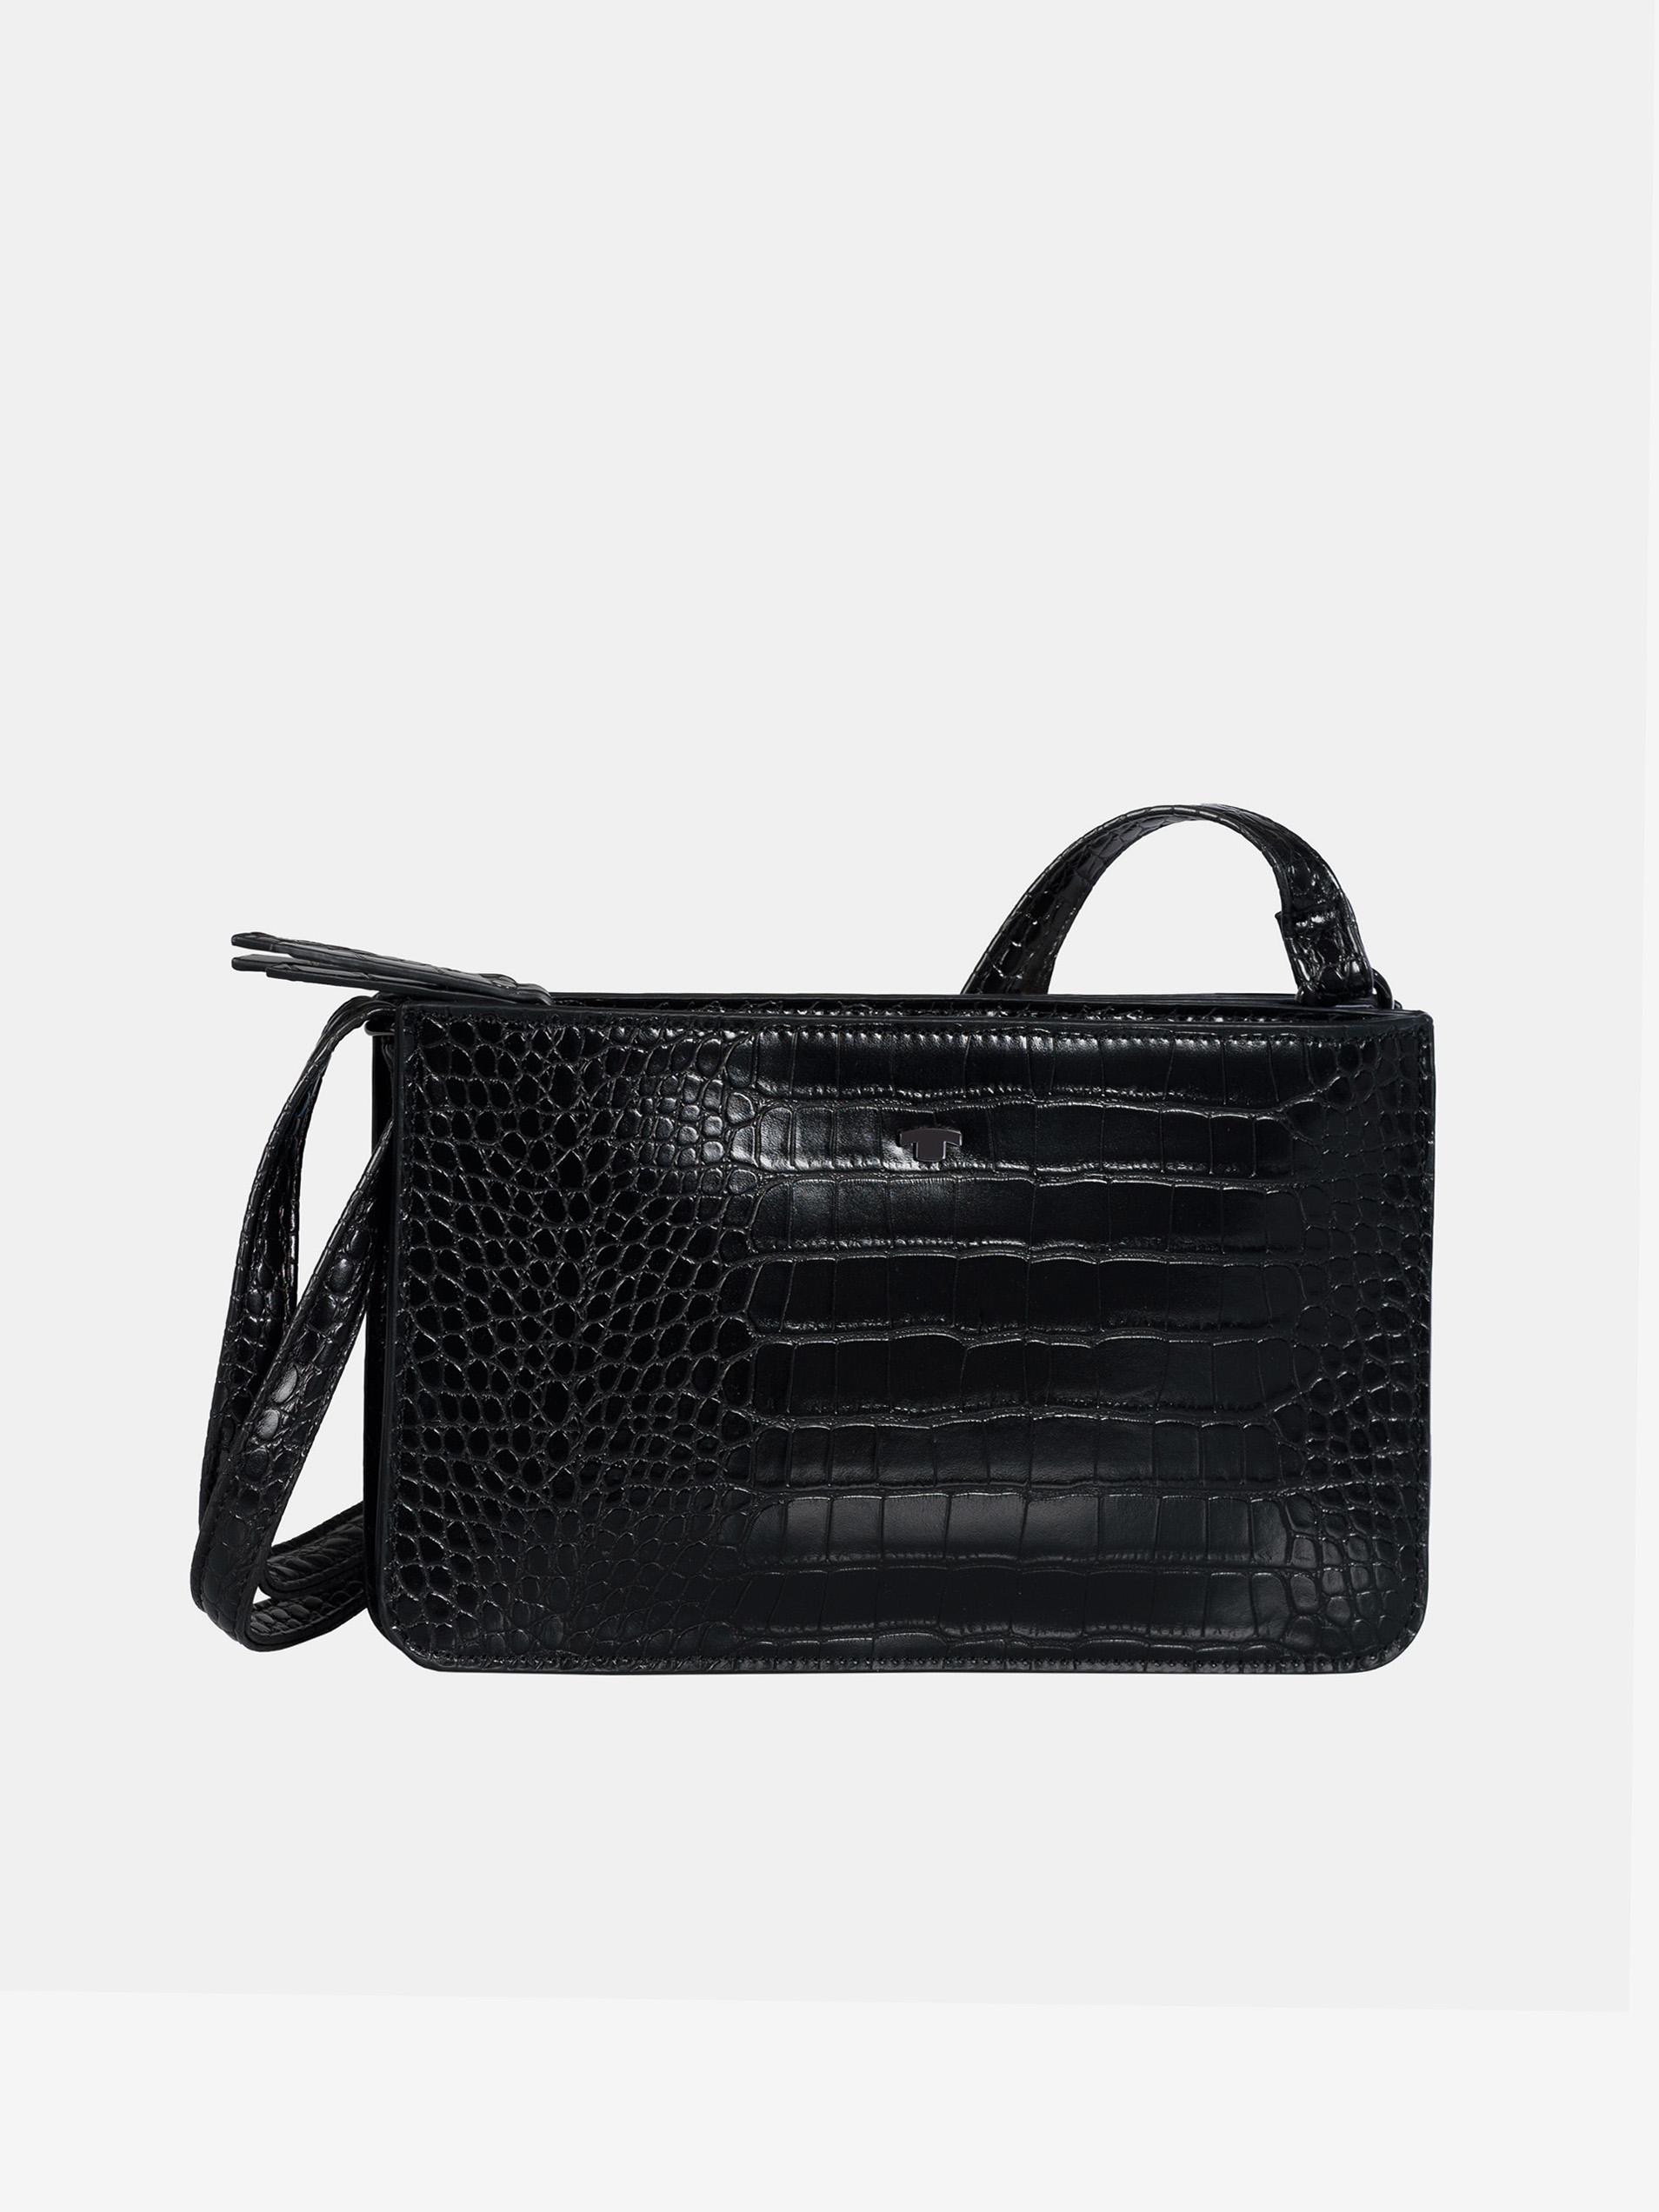 Black crossbody handbag with a crocodile pattern by Tom Tailor